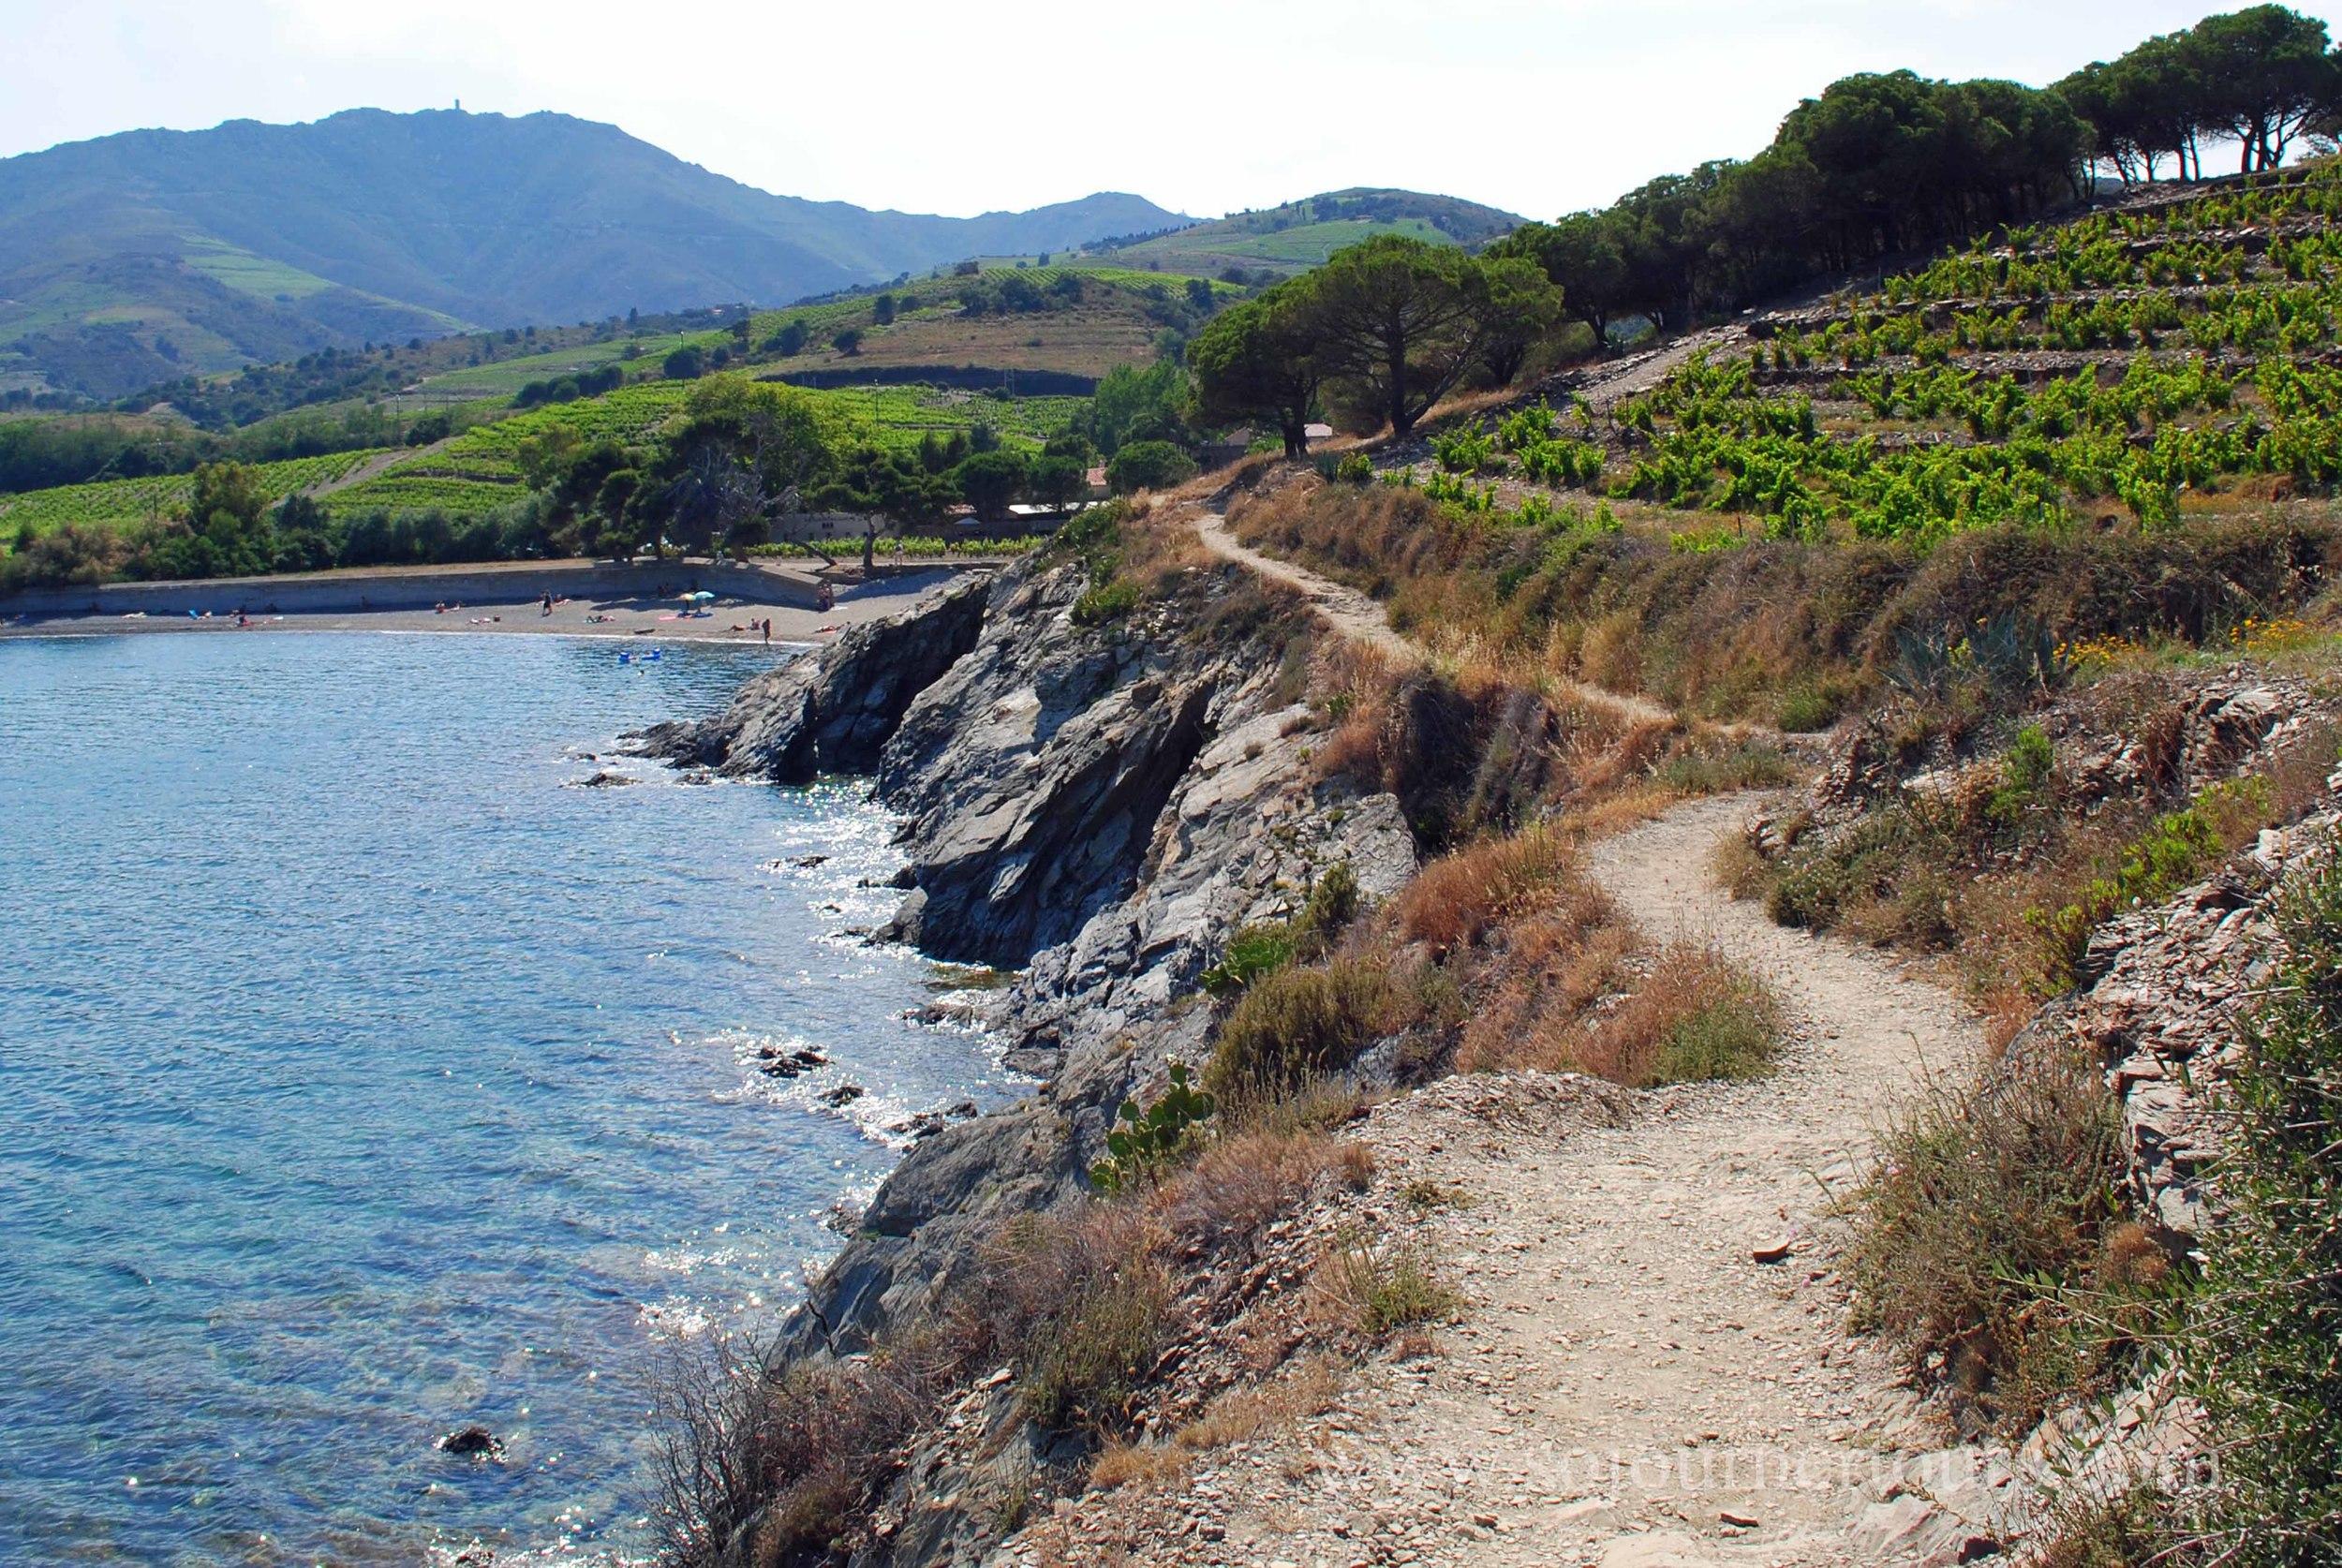 Hiking around Cape Béar